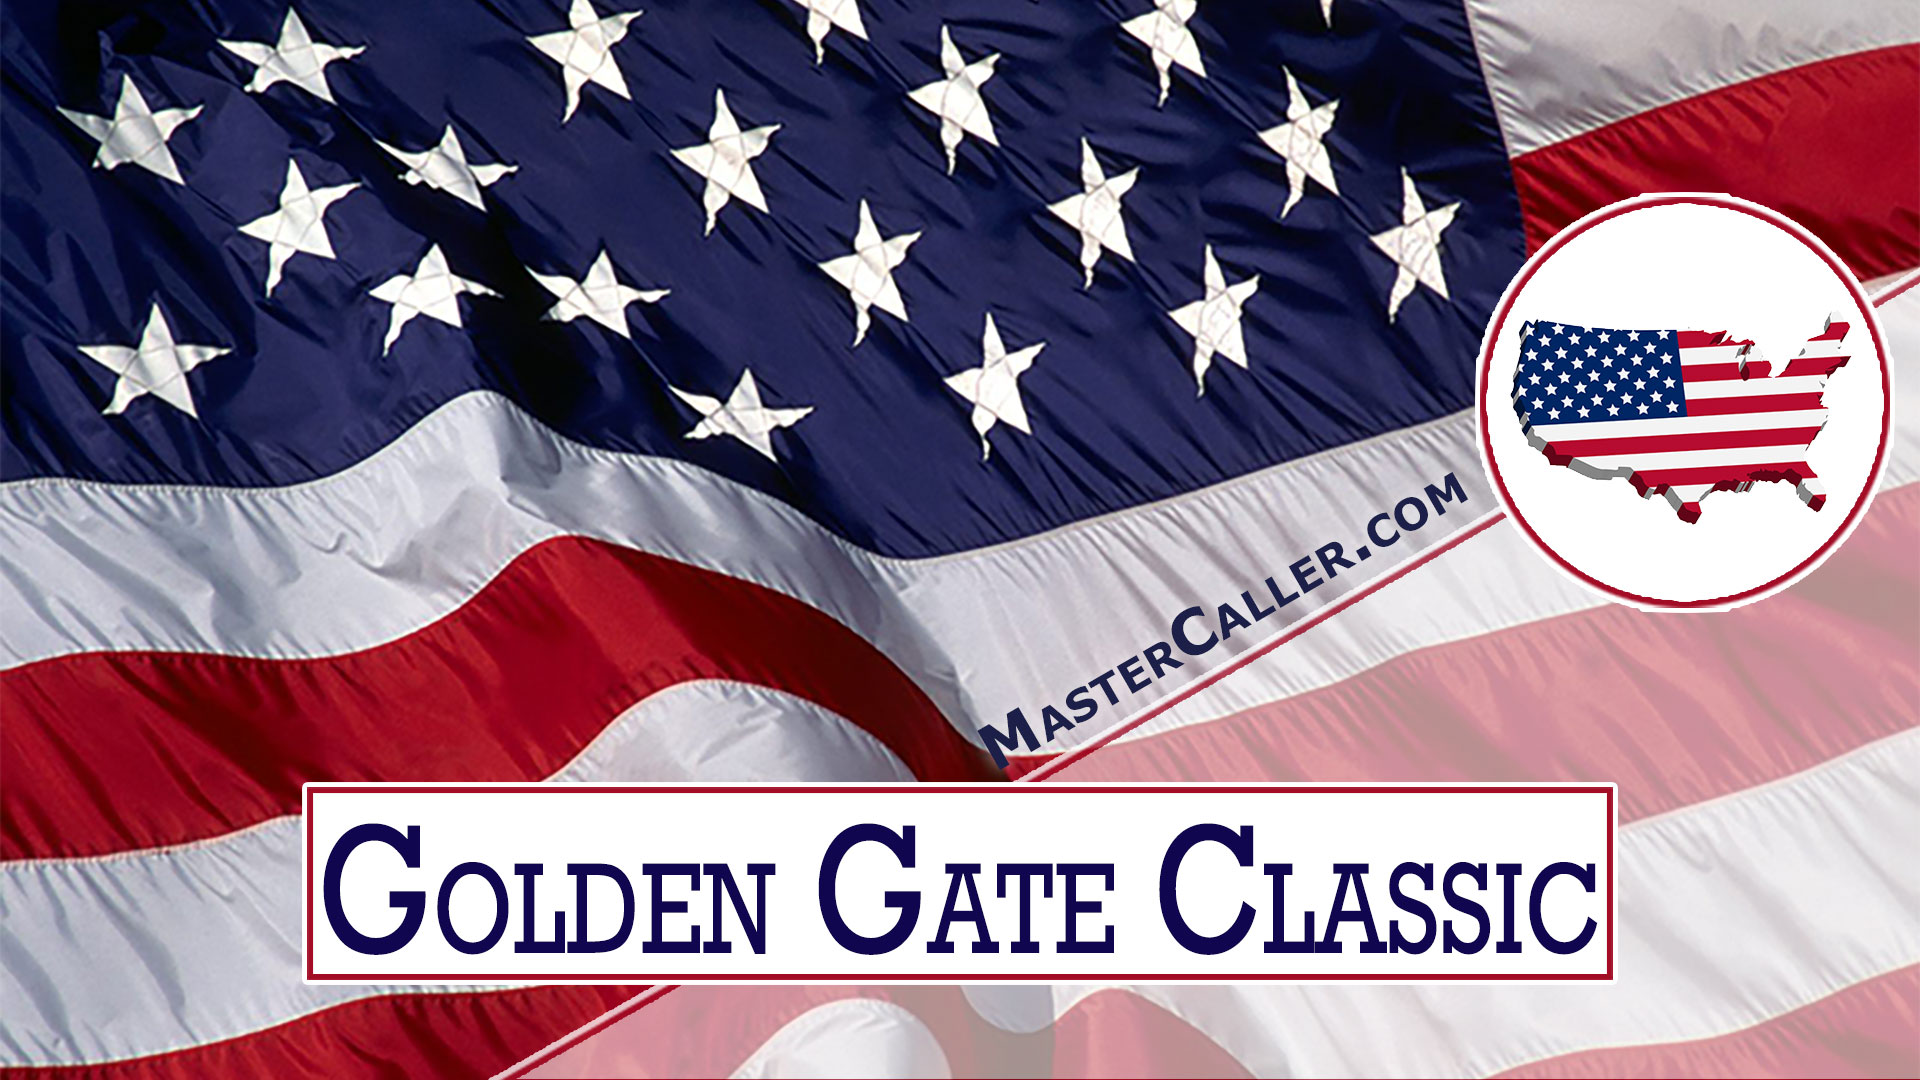 Golden Gate Classic Women - 1976 Logo